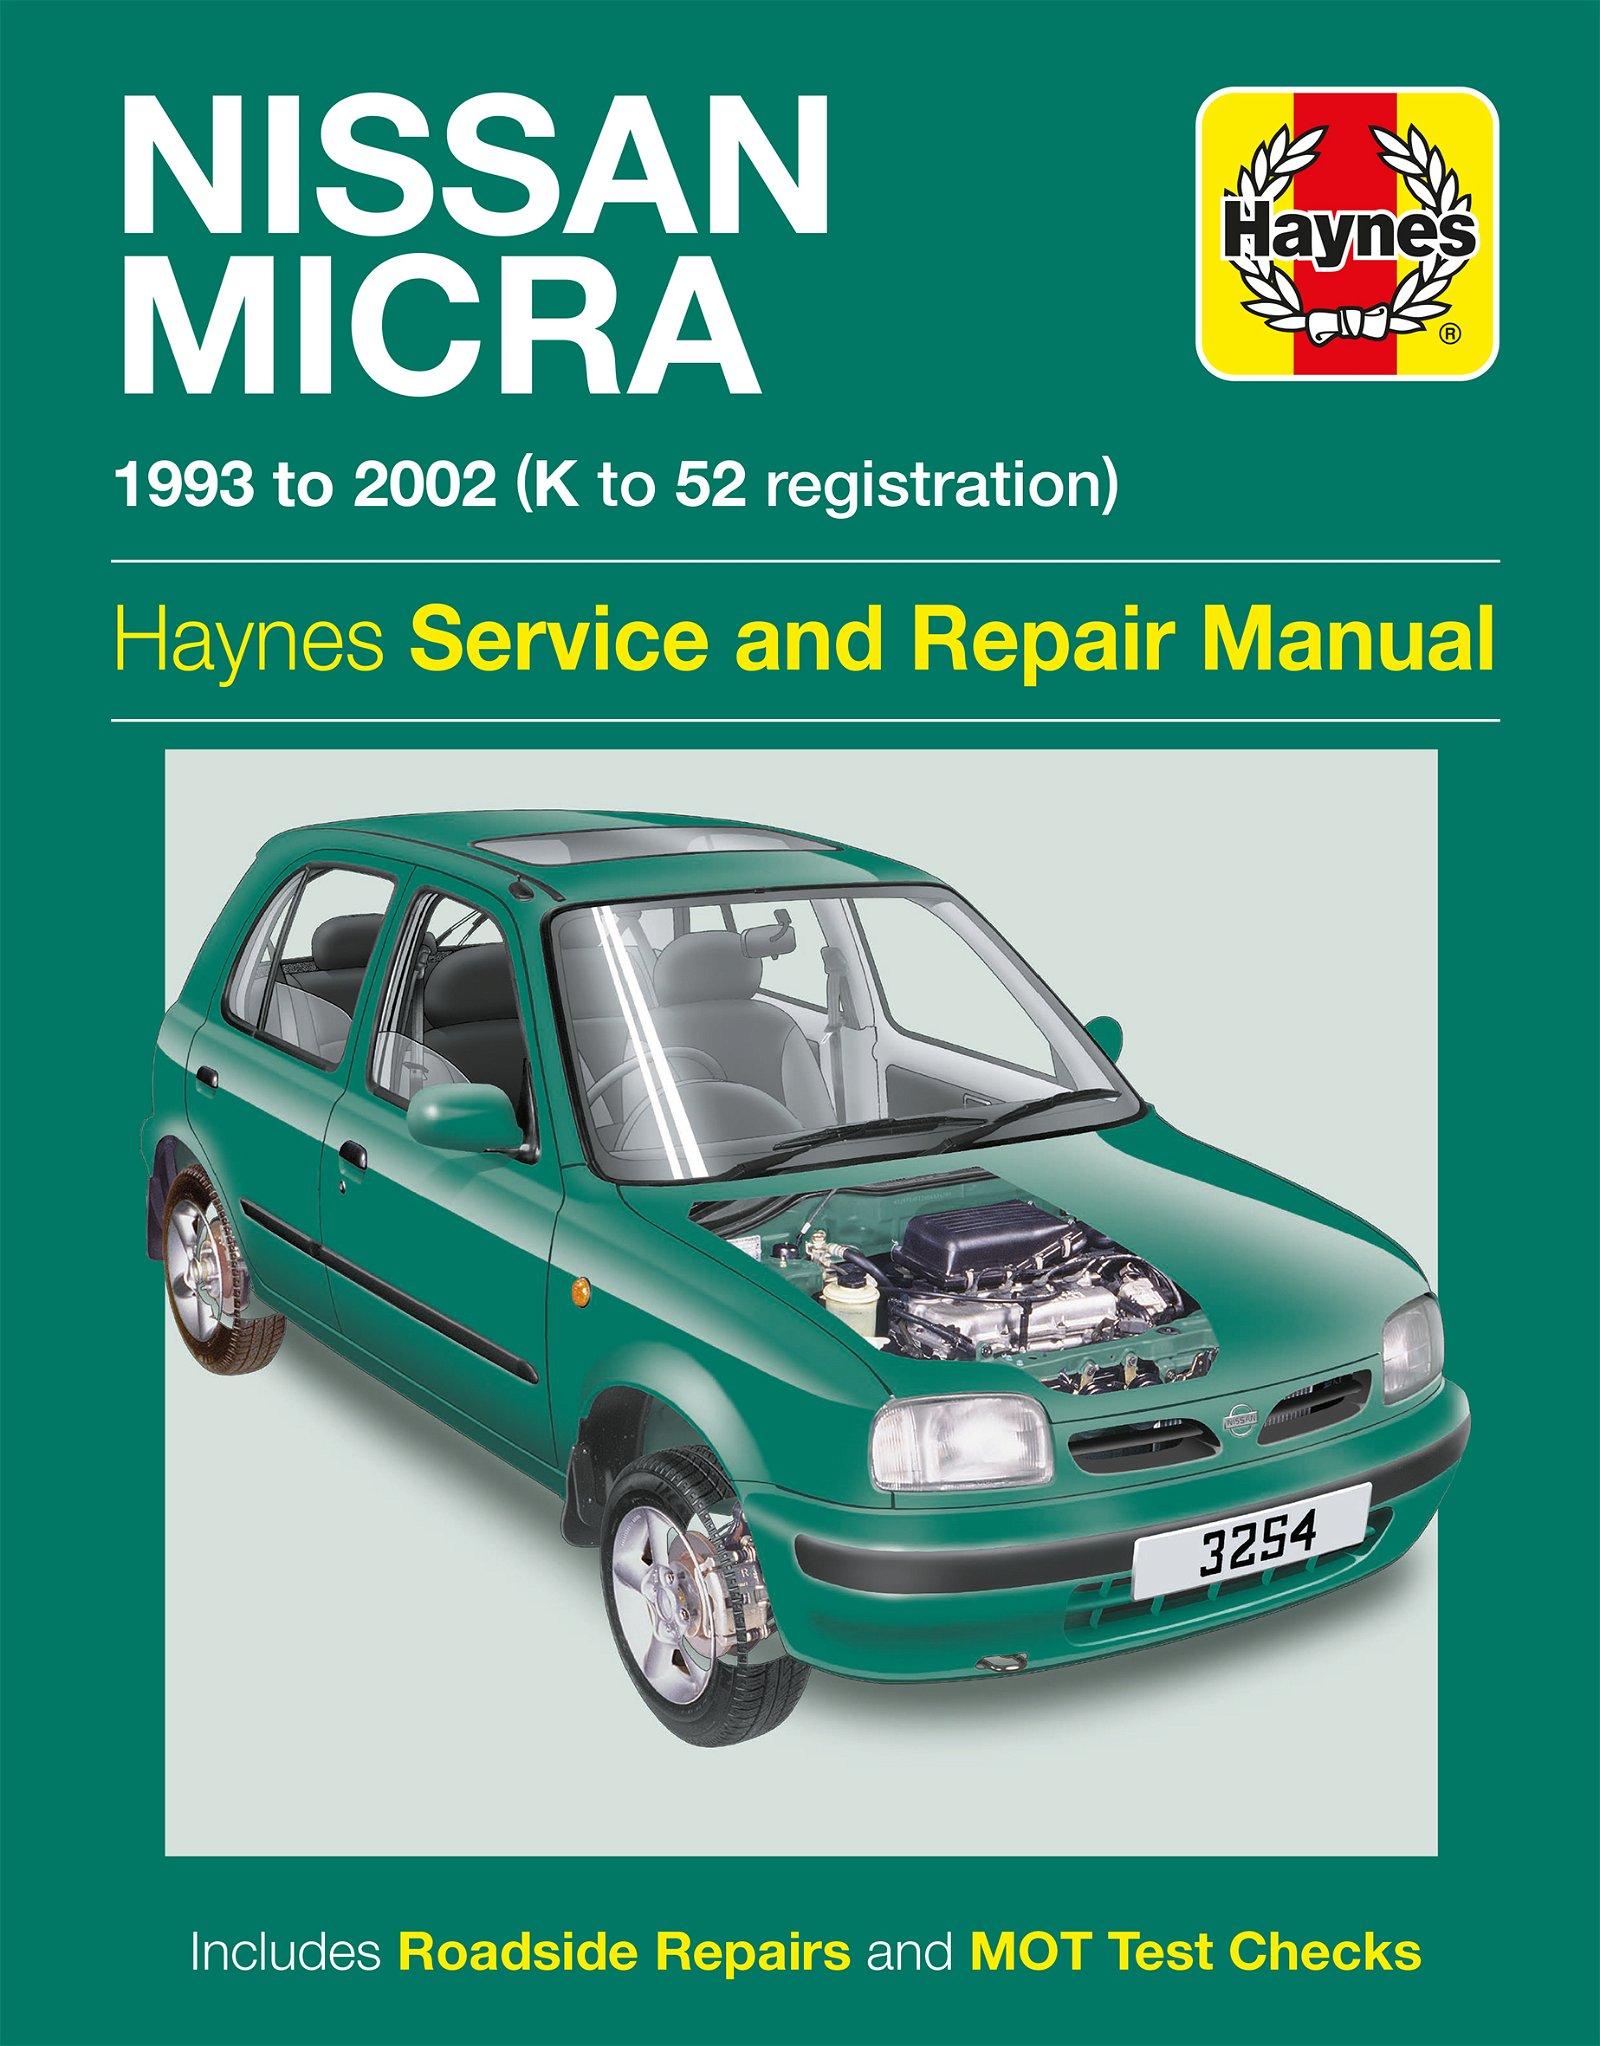 [Manuel UK en Anglais] Nissan Micra  (93 - 02)  K to 52